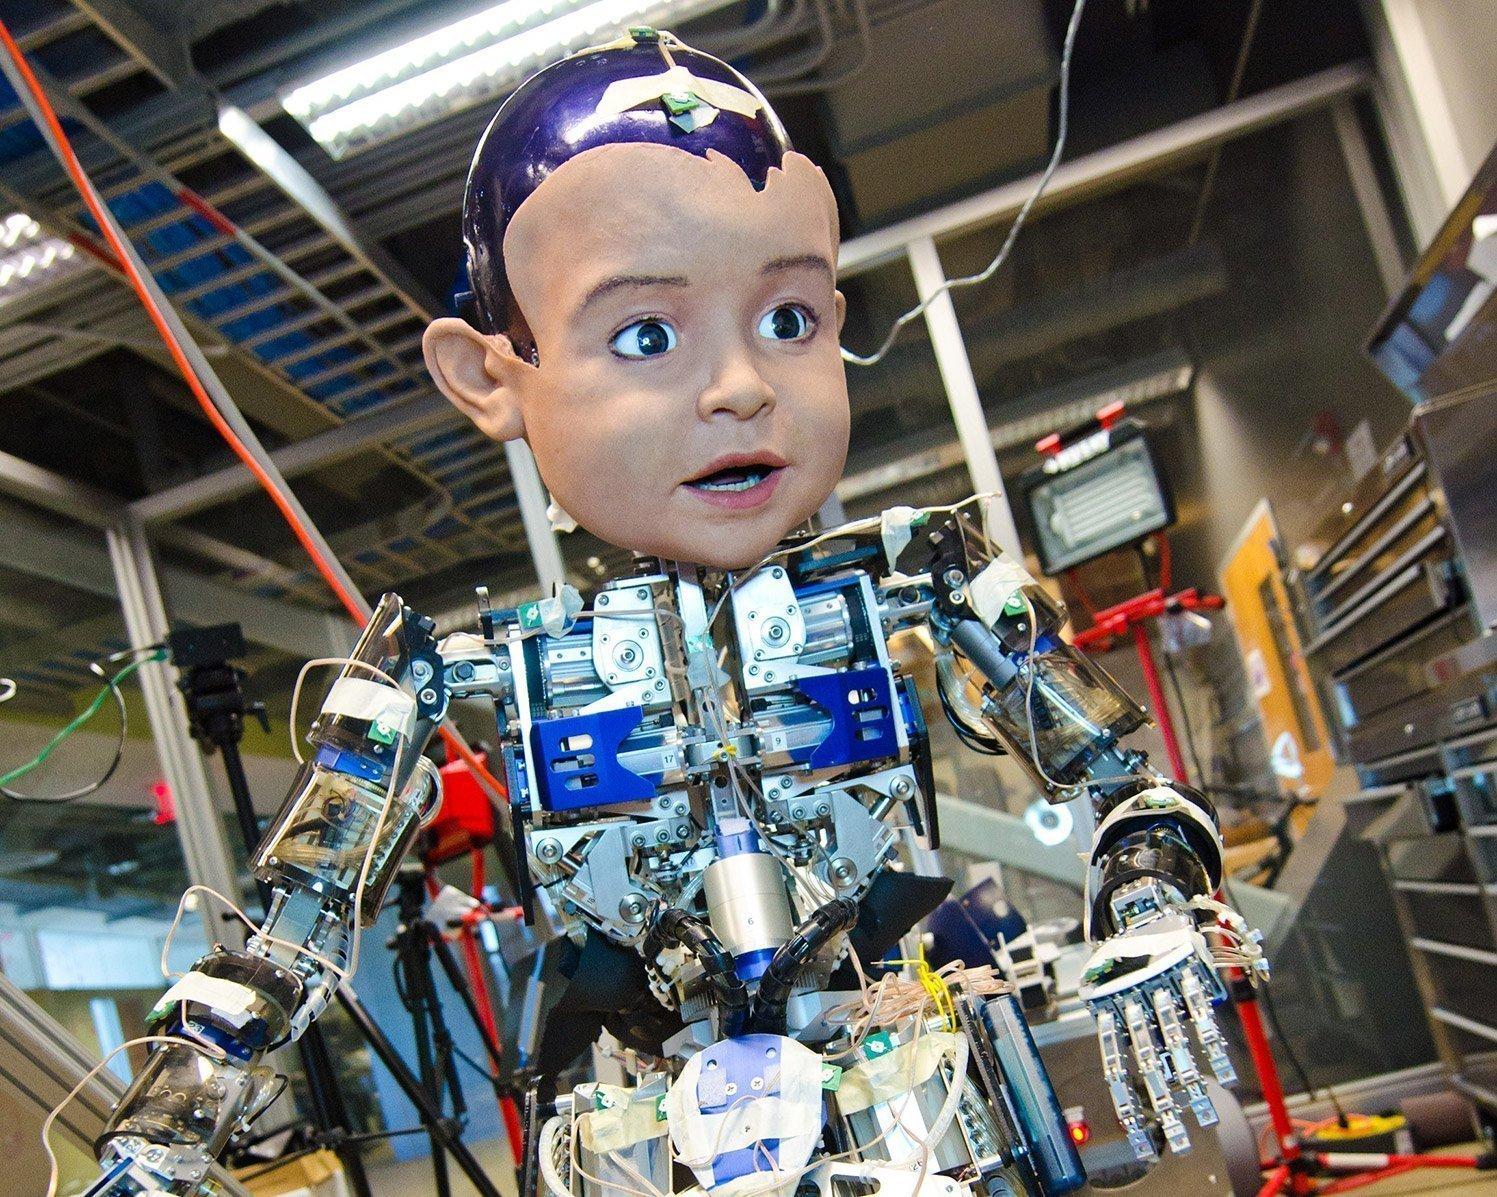 School S New Robotics Institute Will Focus On Machines That Help